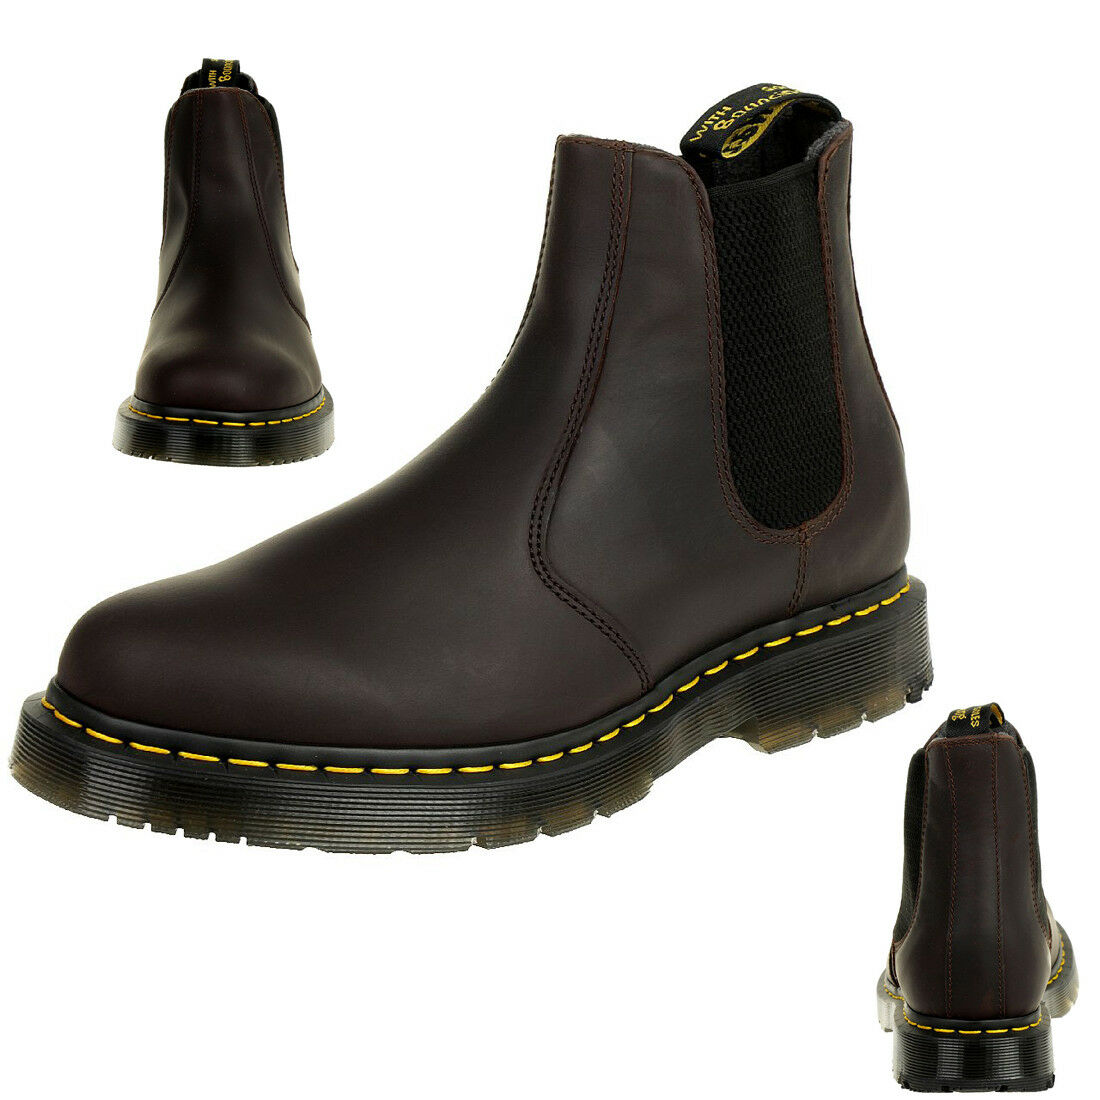 Dr. Martens señores snowplow WP cocoa 2976 chelsea botas Leather marrón 24042247